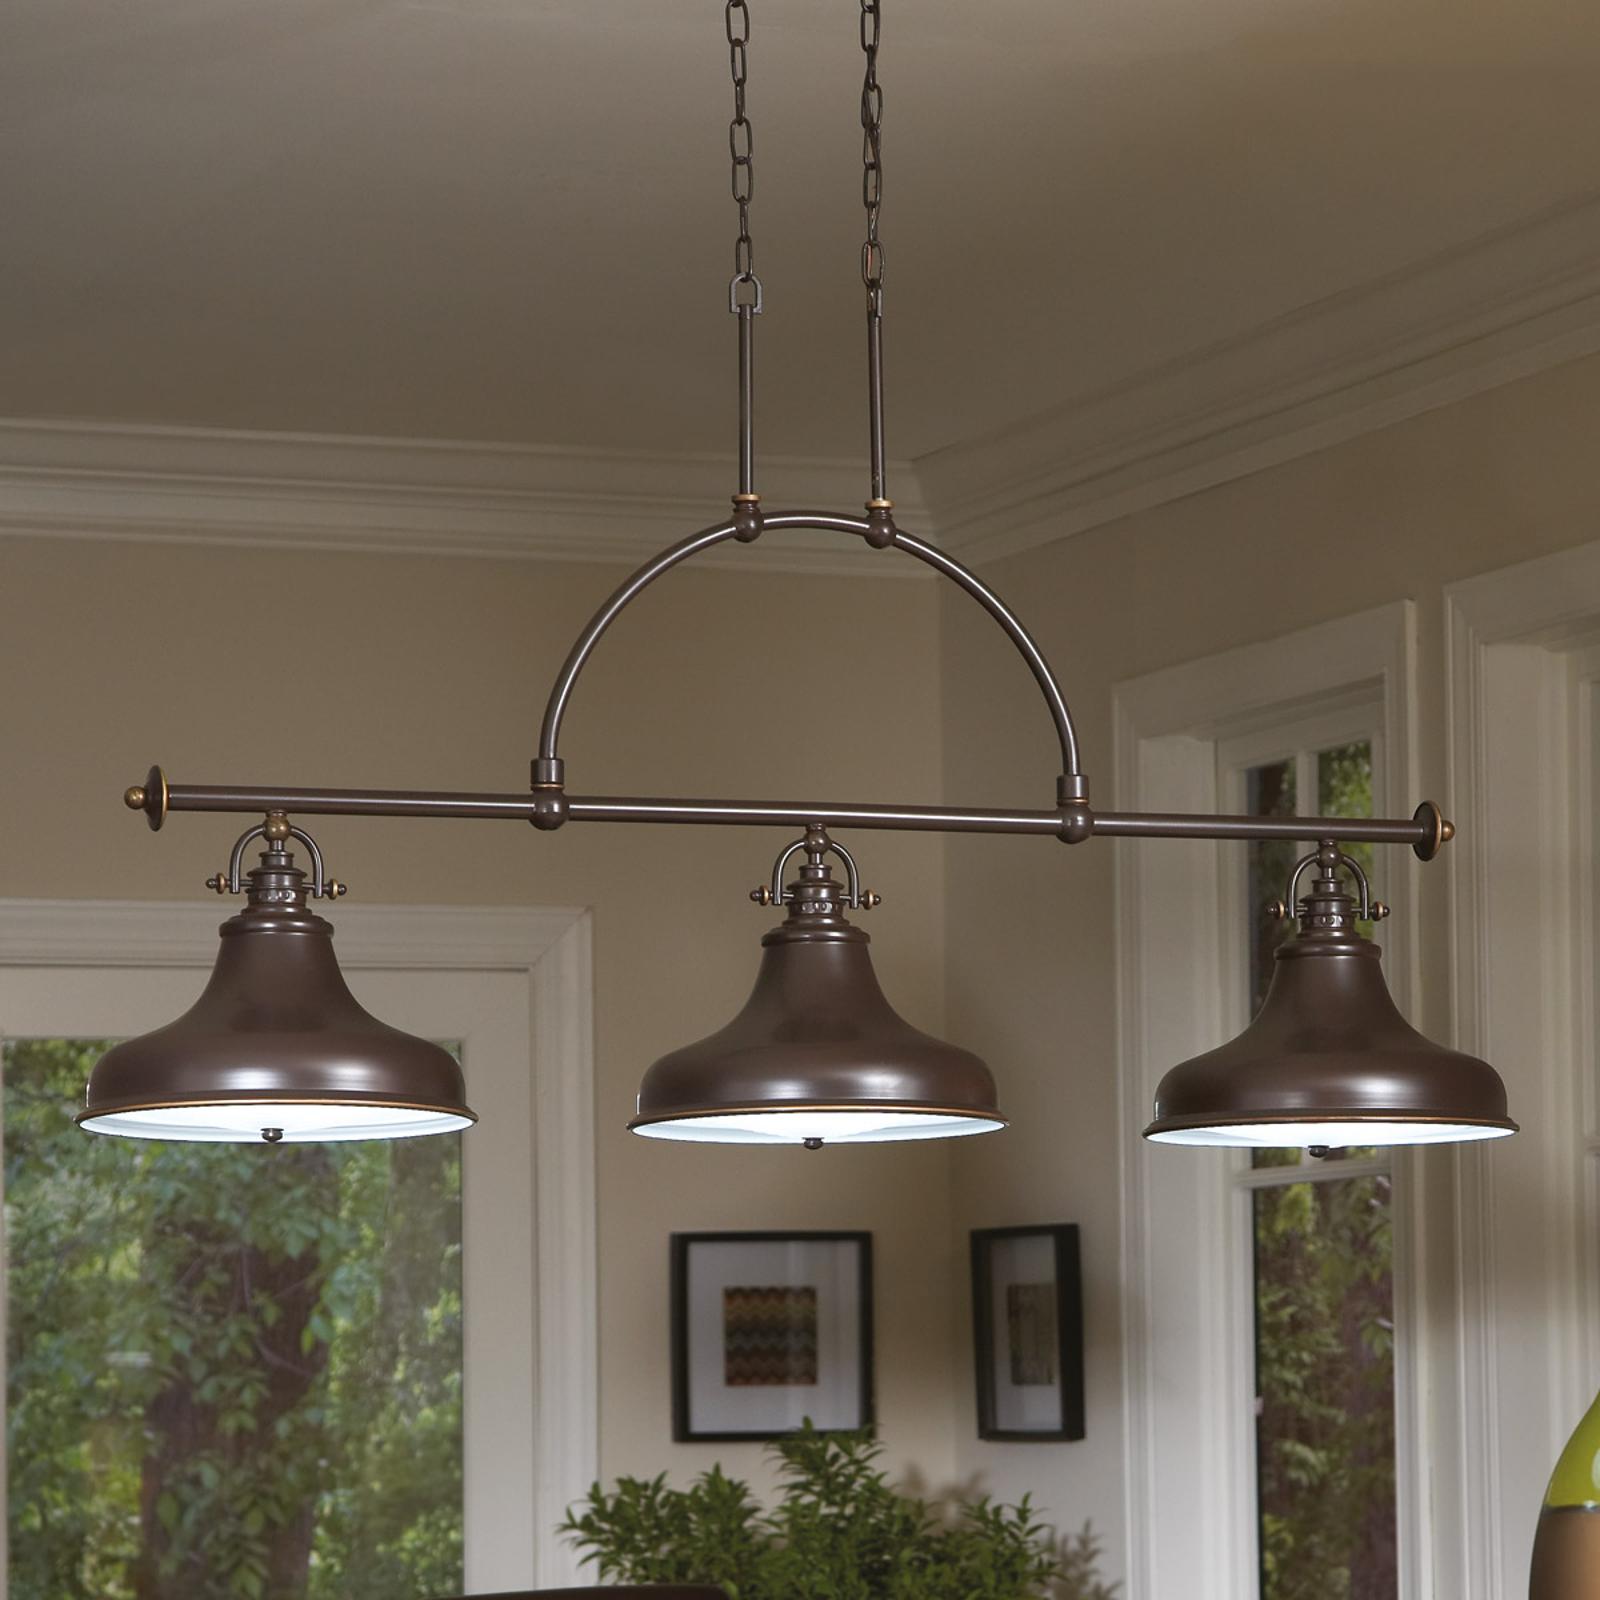 Emery pendellampe industriell bronse 3 lyskilder